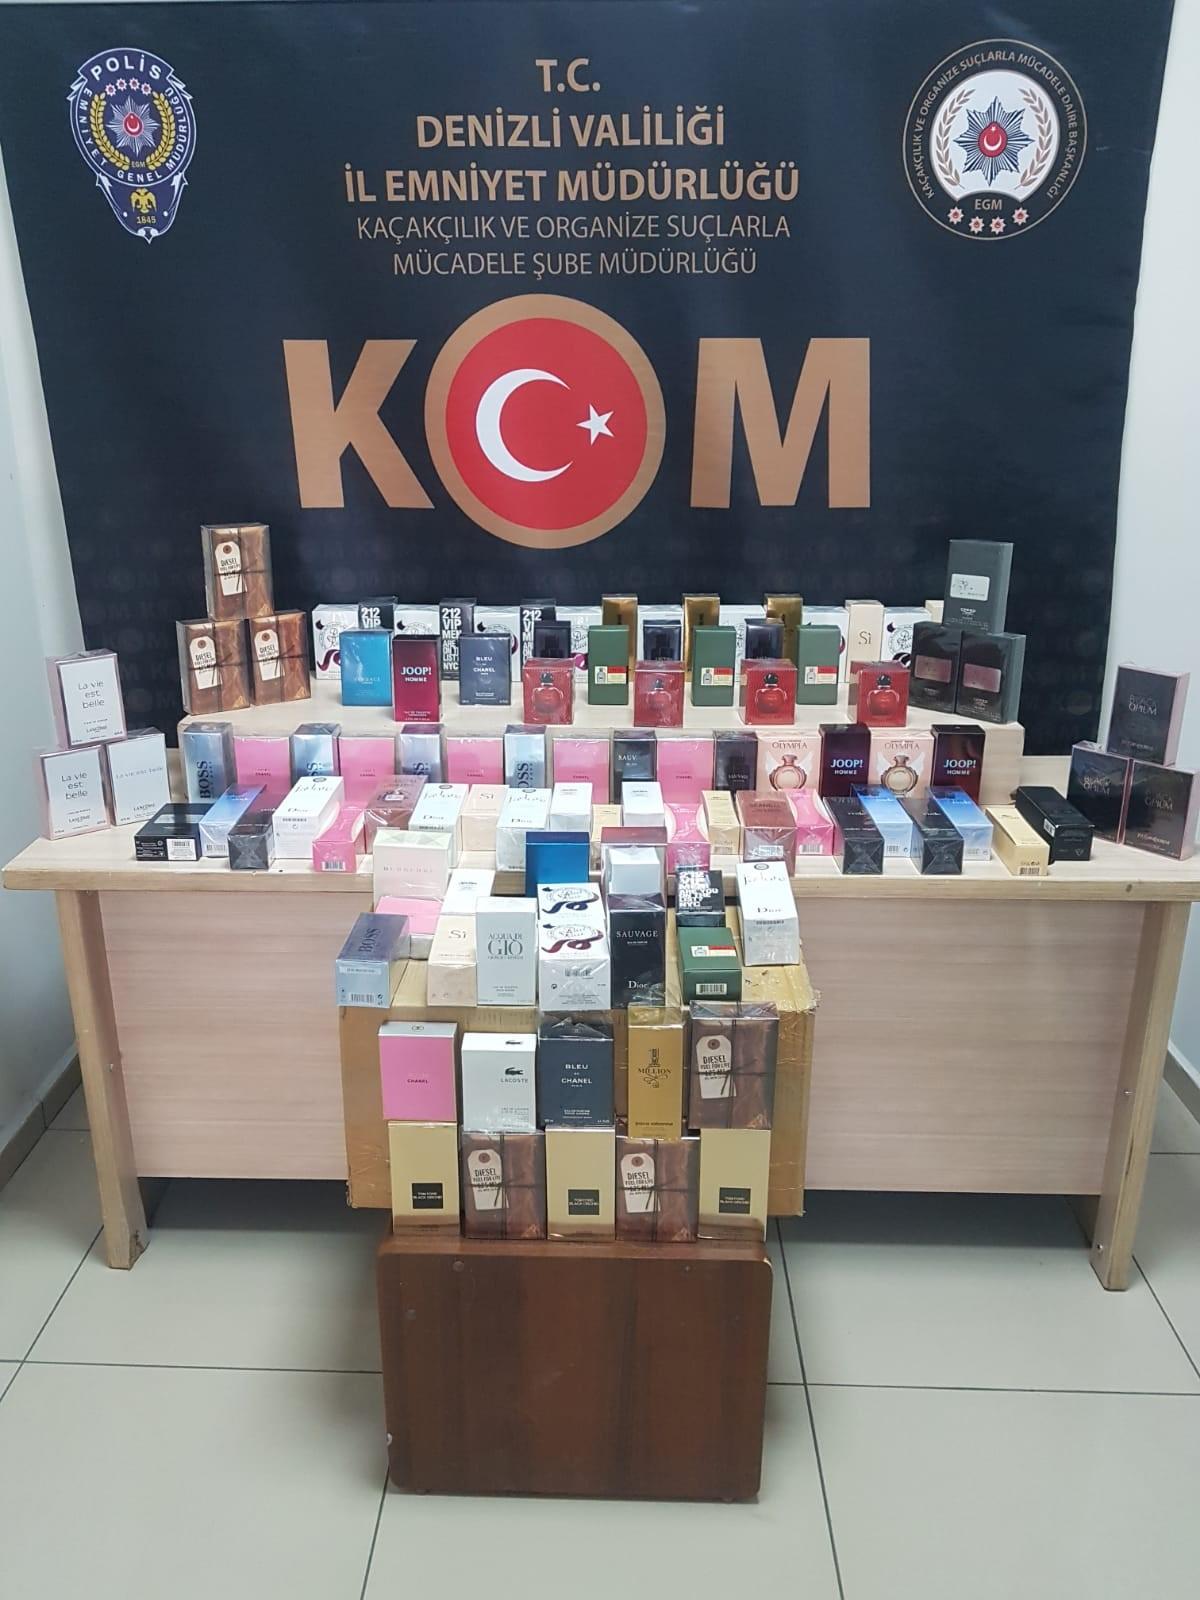 kom 4 - DENİZLİ'DE SAHTE 100 TL'LİK BANKNOTLAR YAKALANDI